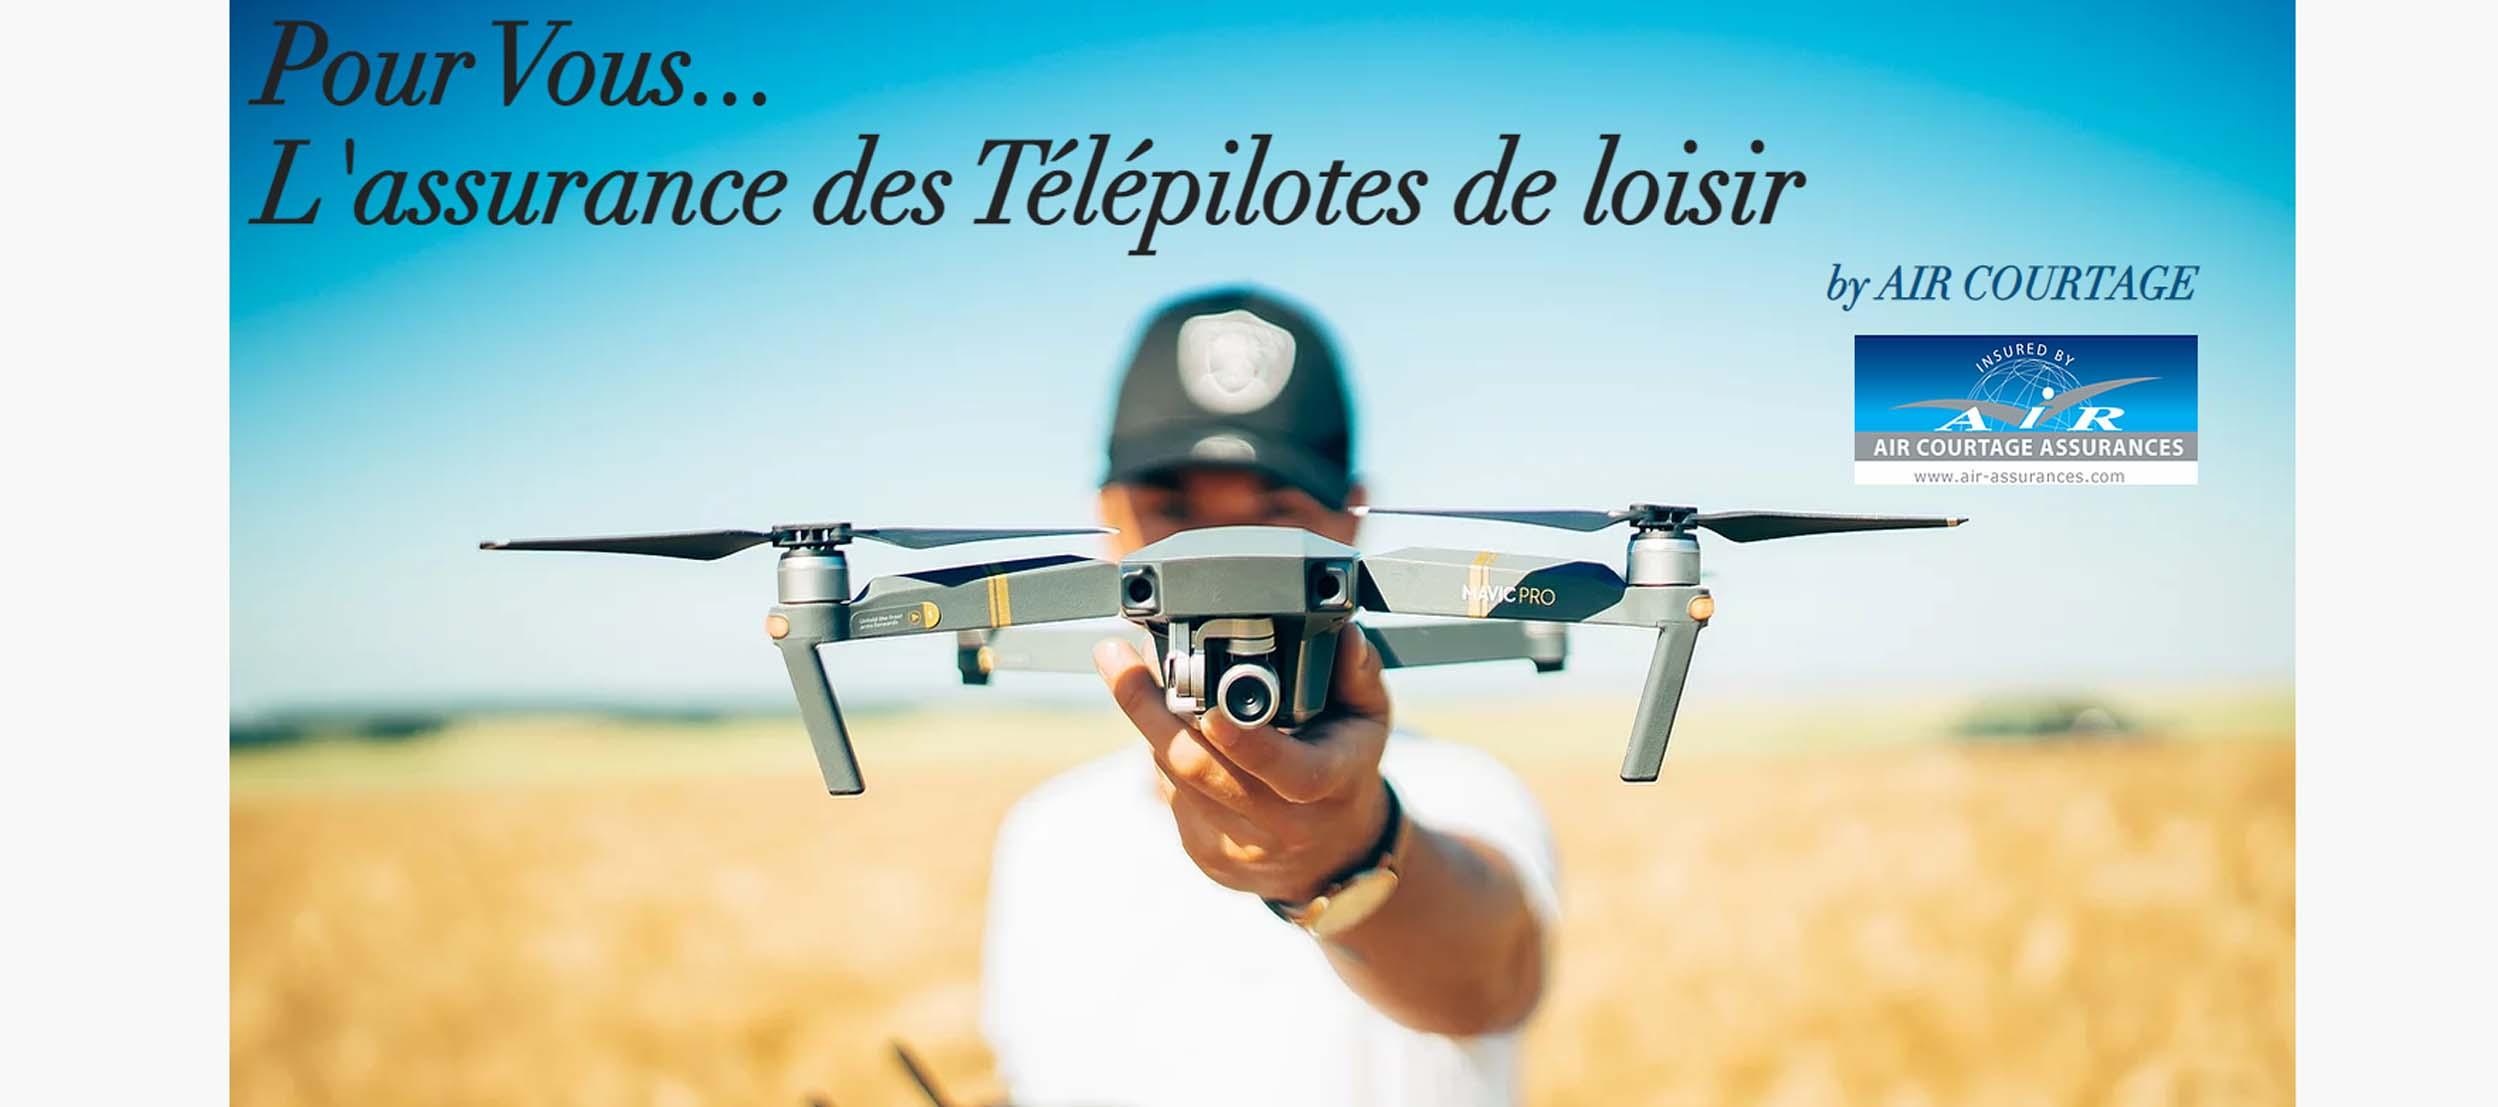 Seguro-para-drones-Air-assurance